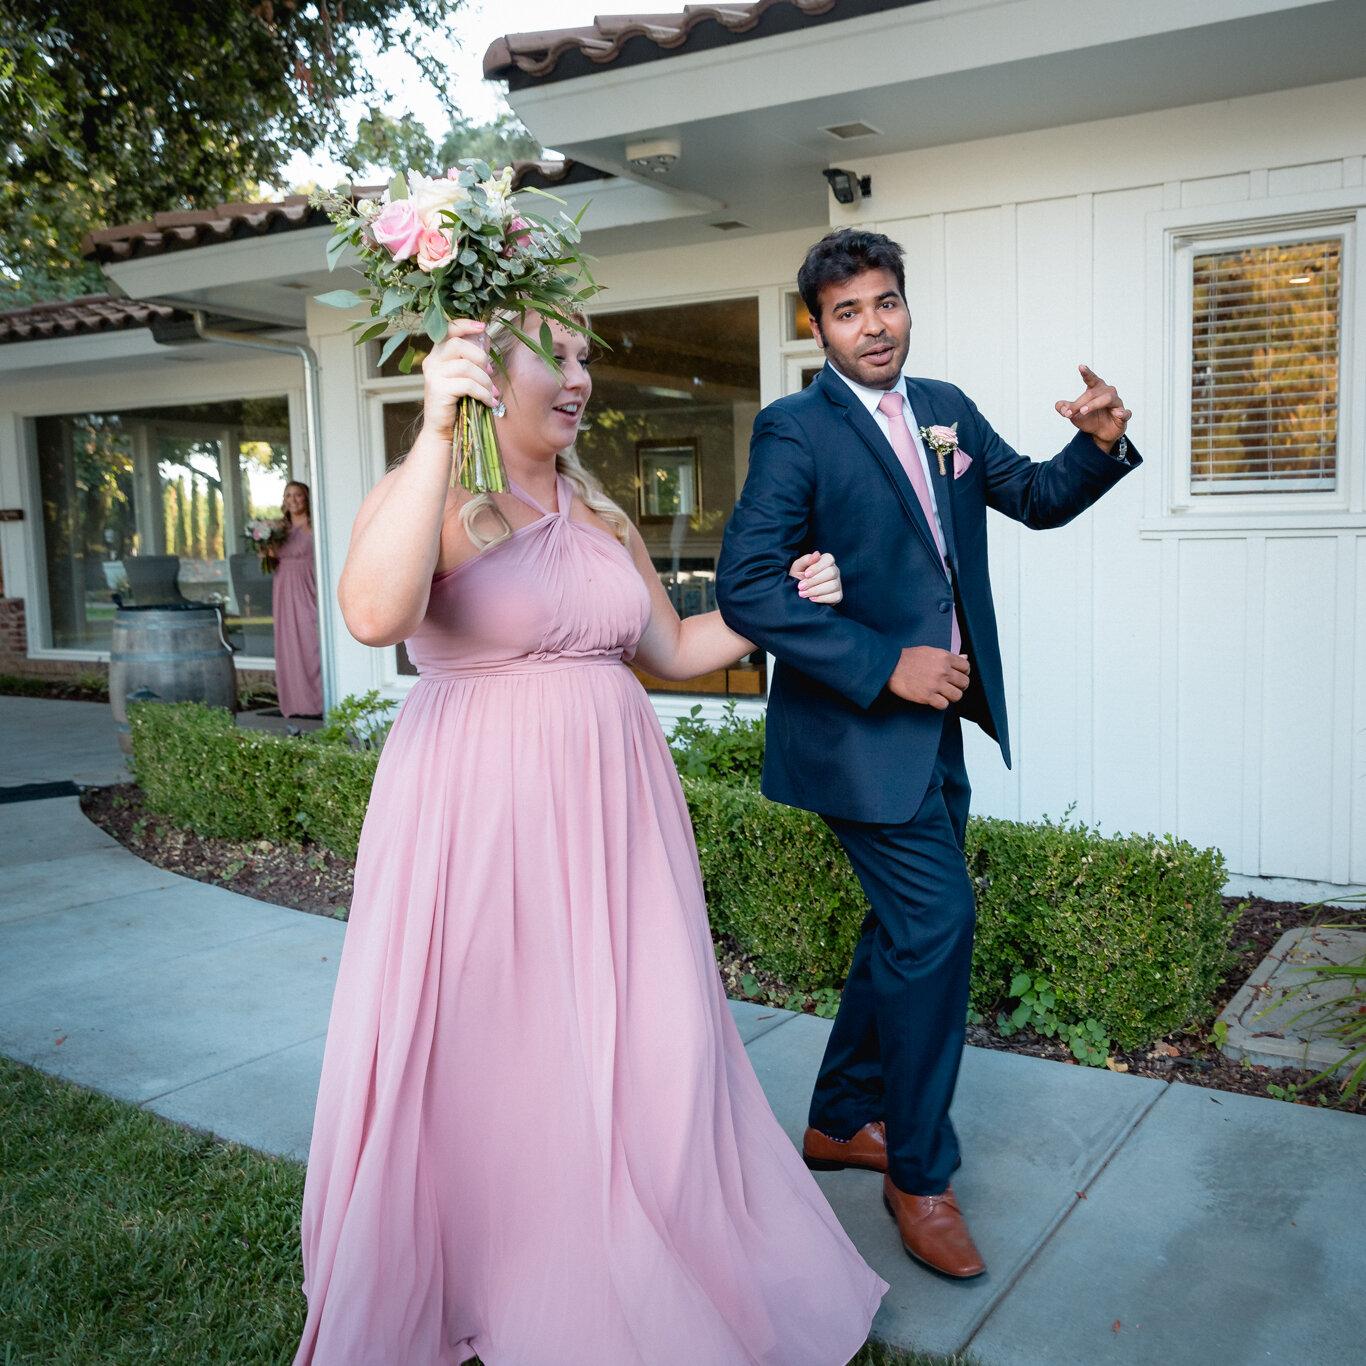 2019.08.24_Emily-Ashir-Wedding-at-the-Maples-6154.jpg